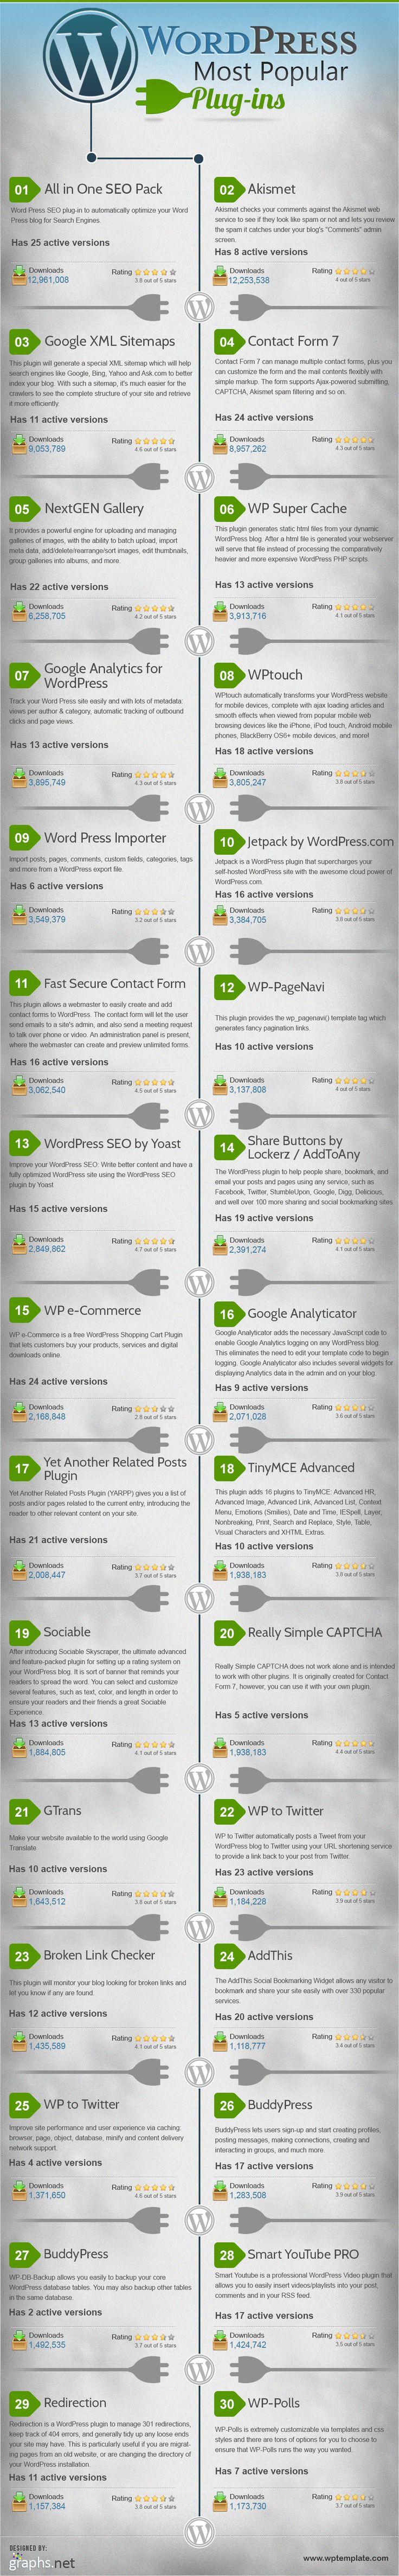 WordPress Most Popular Plugins Infographic